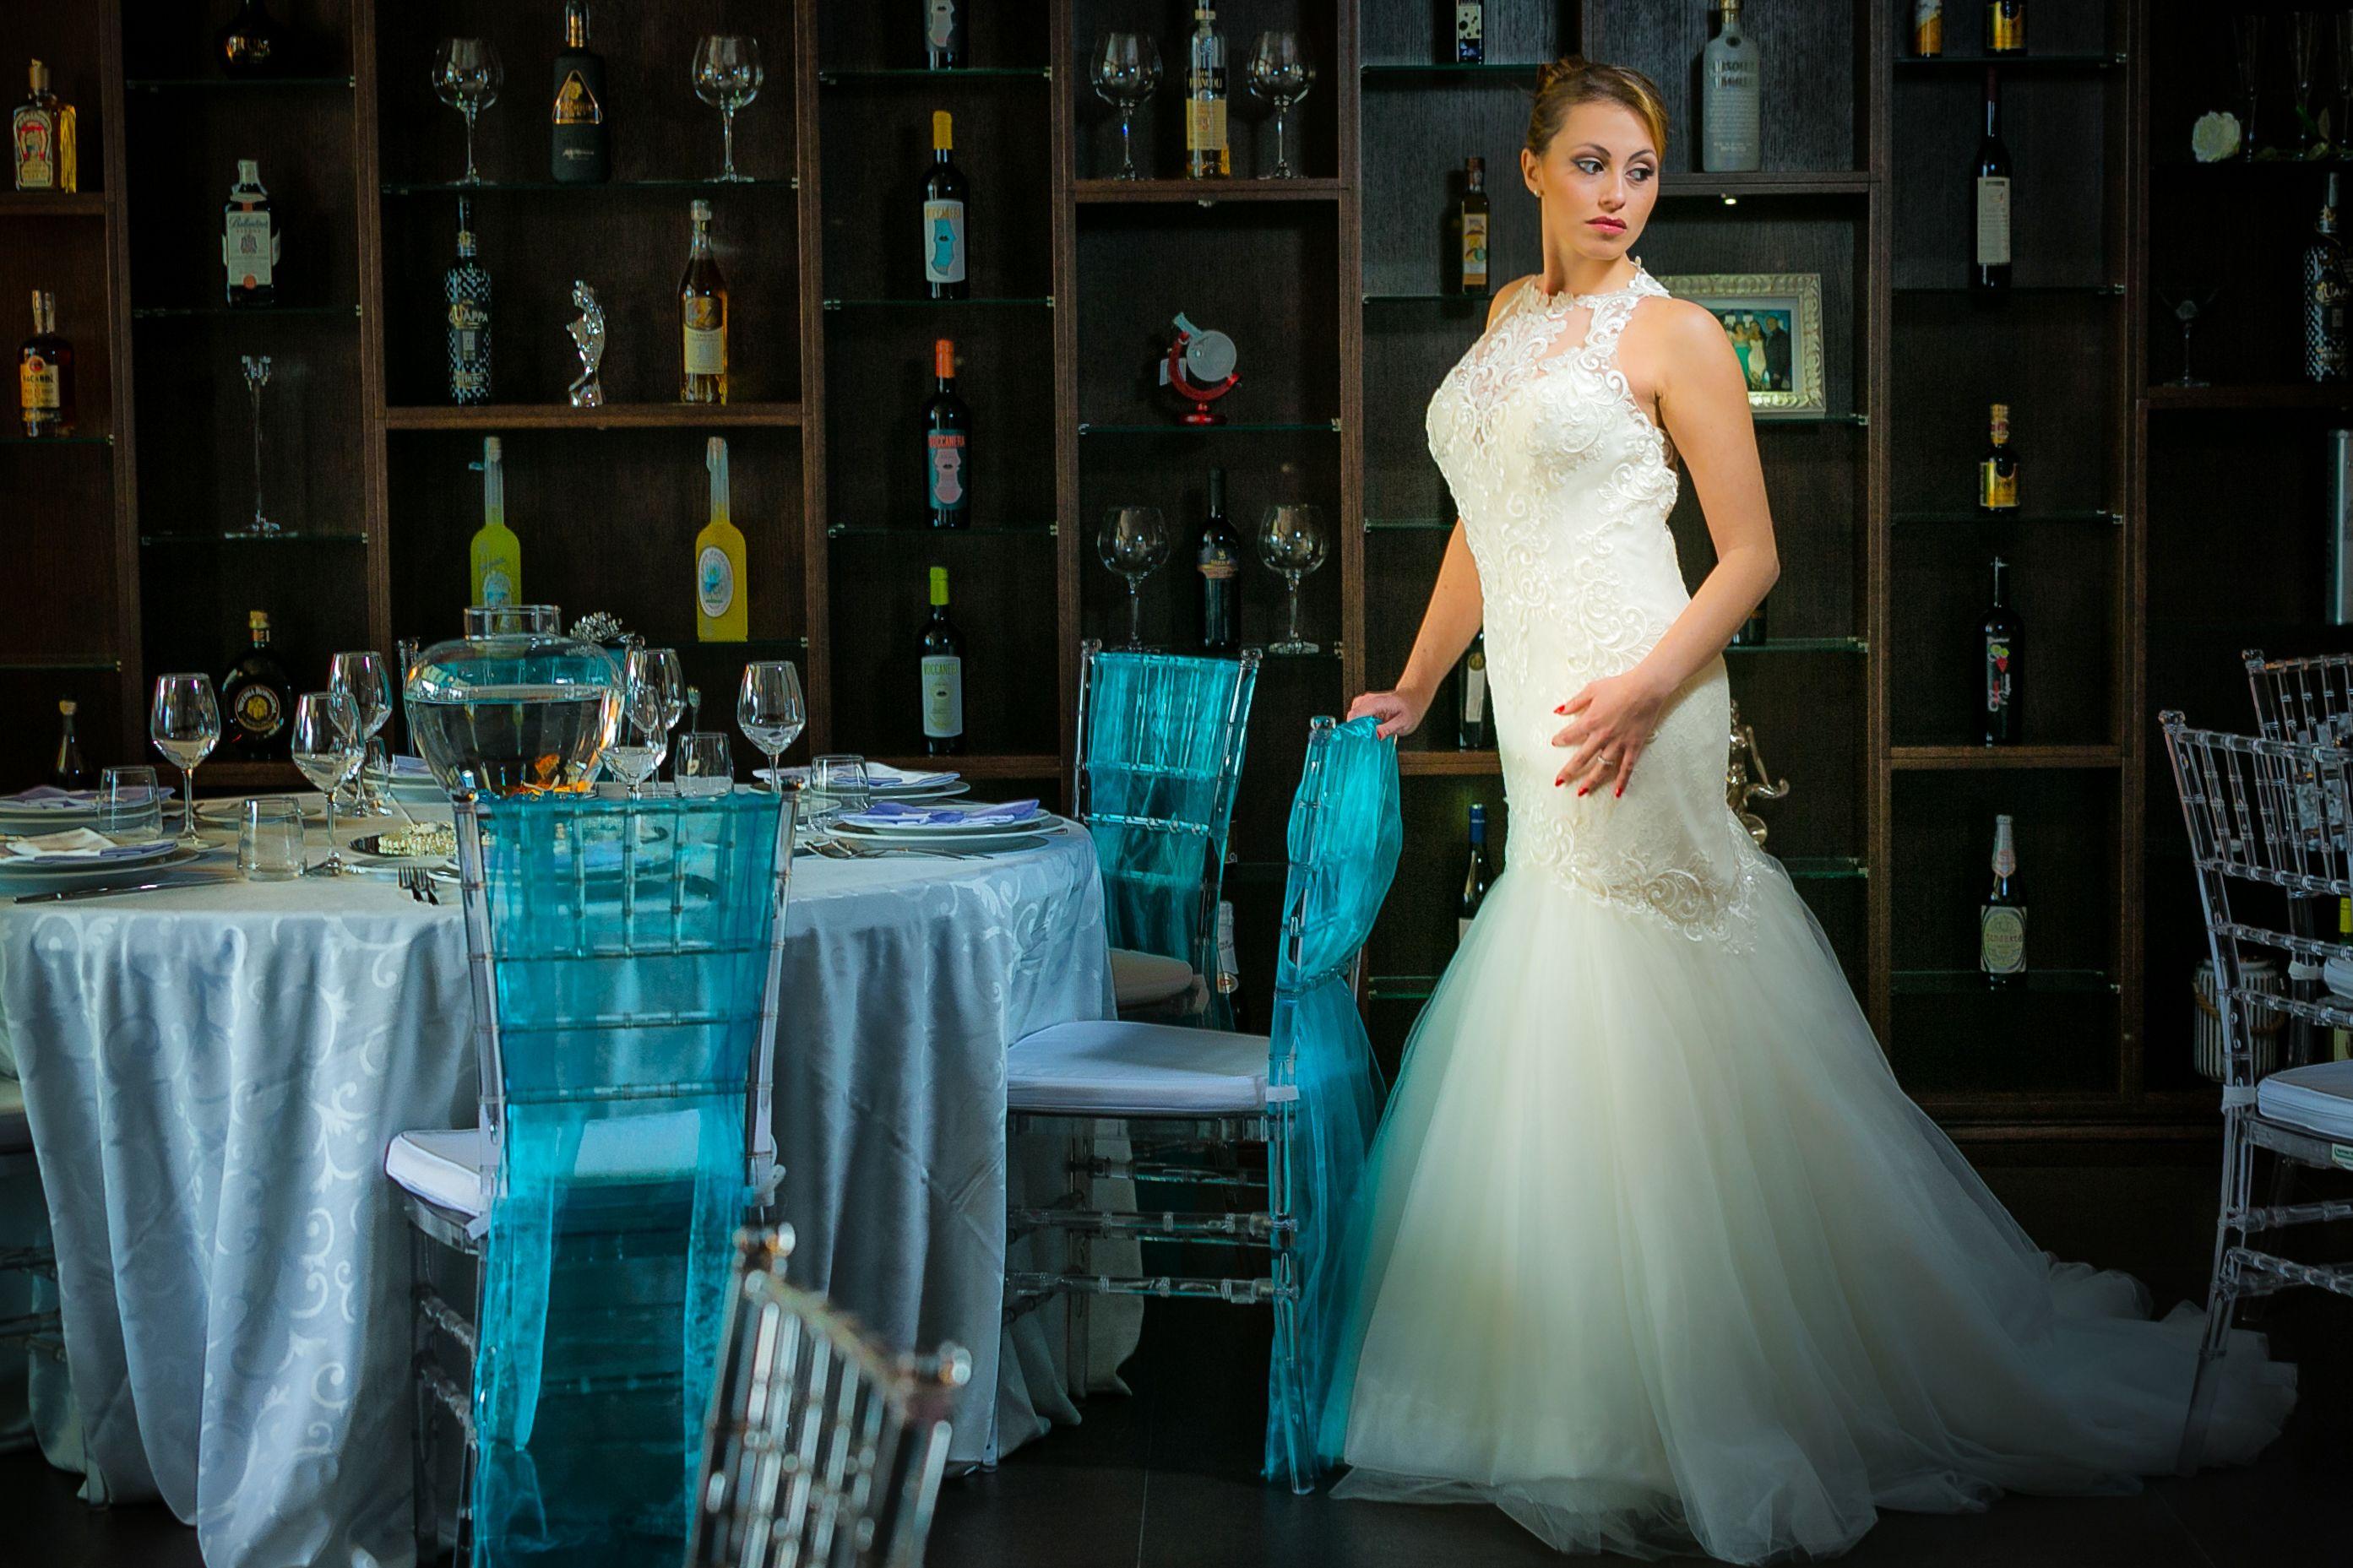 #PhoenixClub #Location #Licola #Matrimonio #Sposa #Bride #TuttoSposi #Fiera #Wedding #Campania